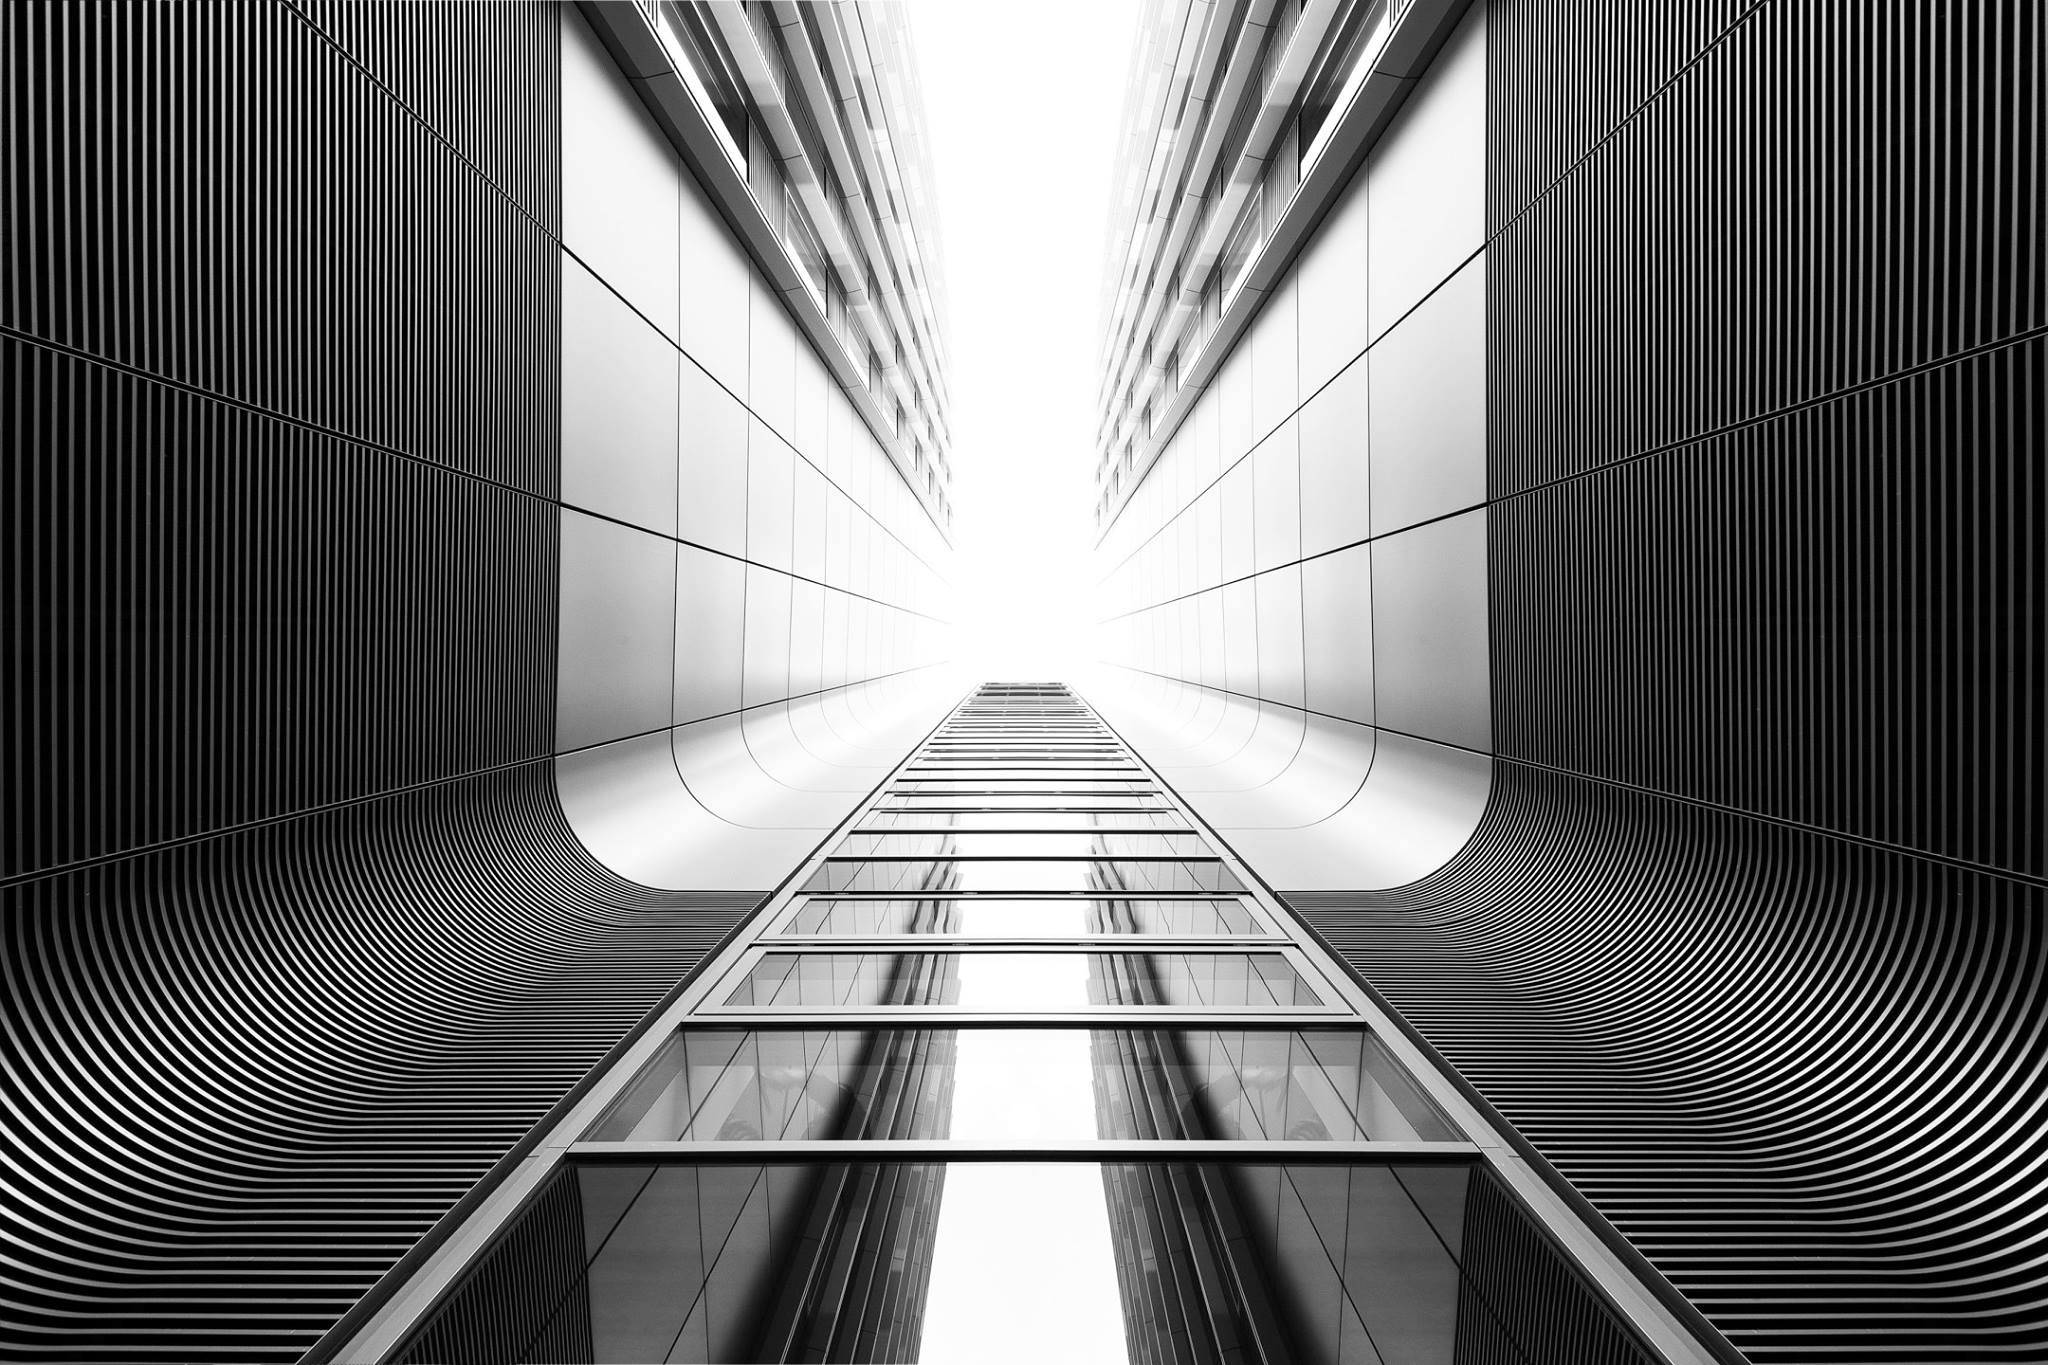 kevin-krautgartner-architecture-photography-02